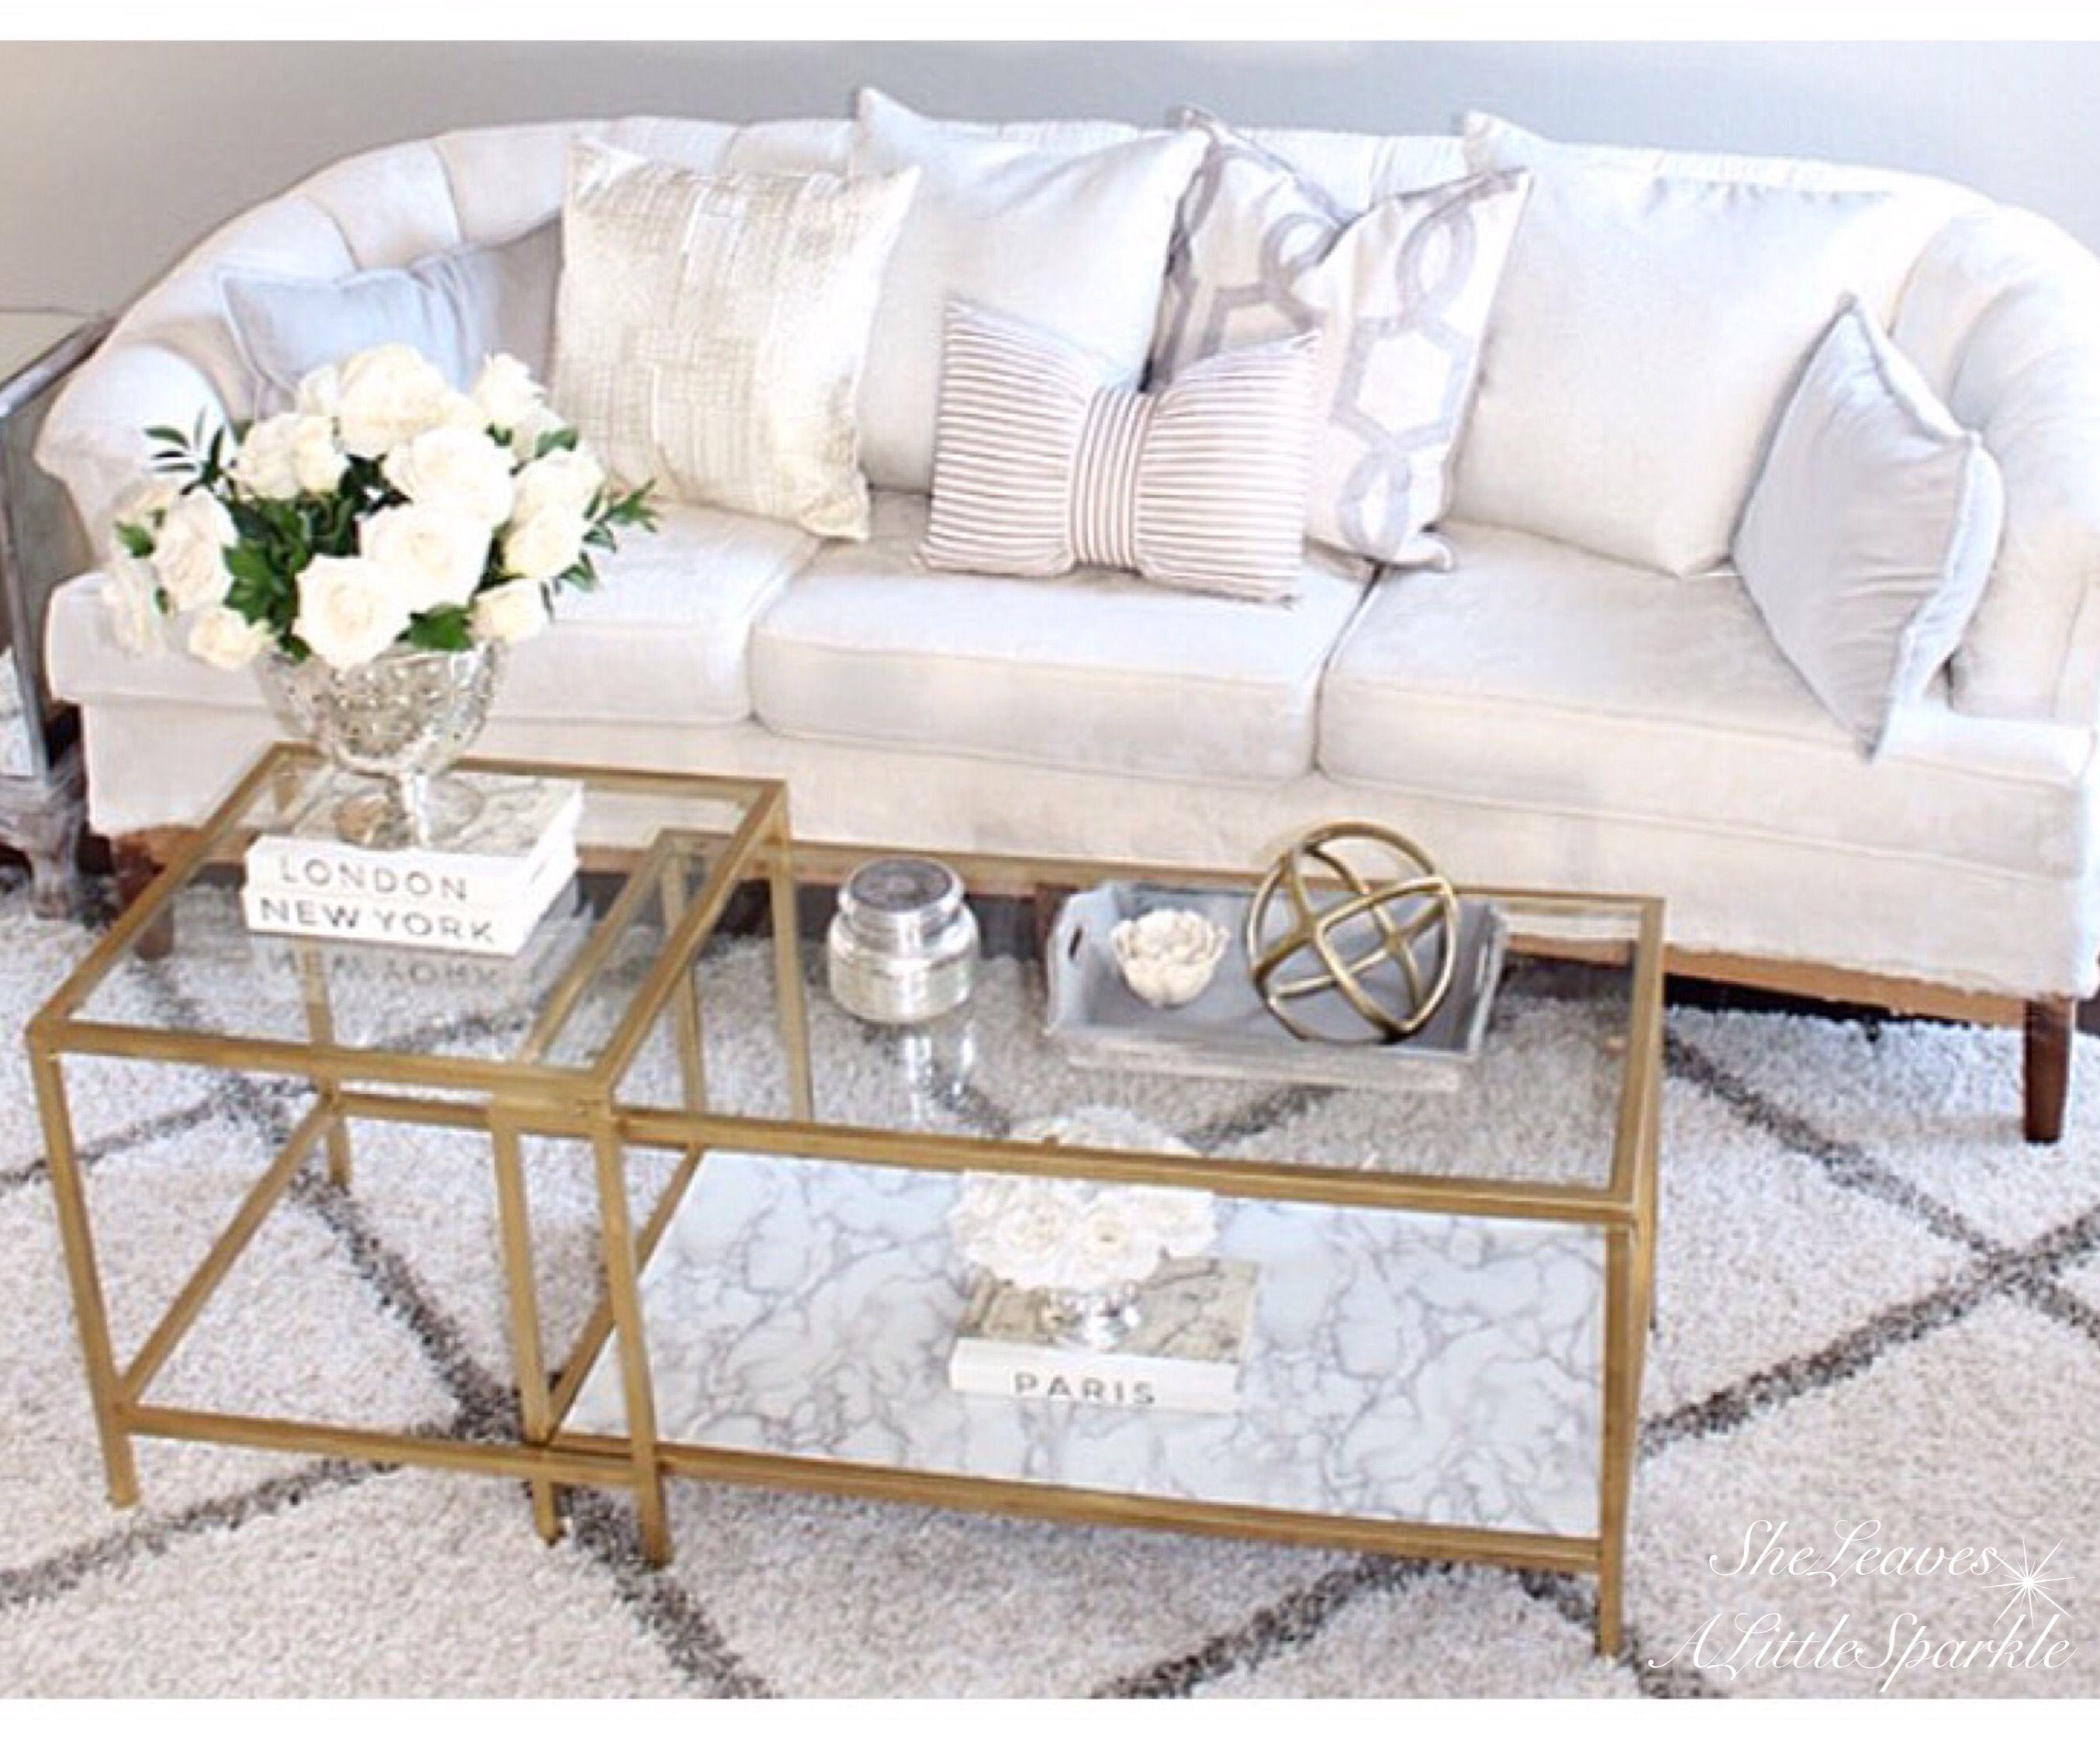 Most Popular Coffee Tables Sheleavesalittlesparkle Diy Ikea